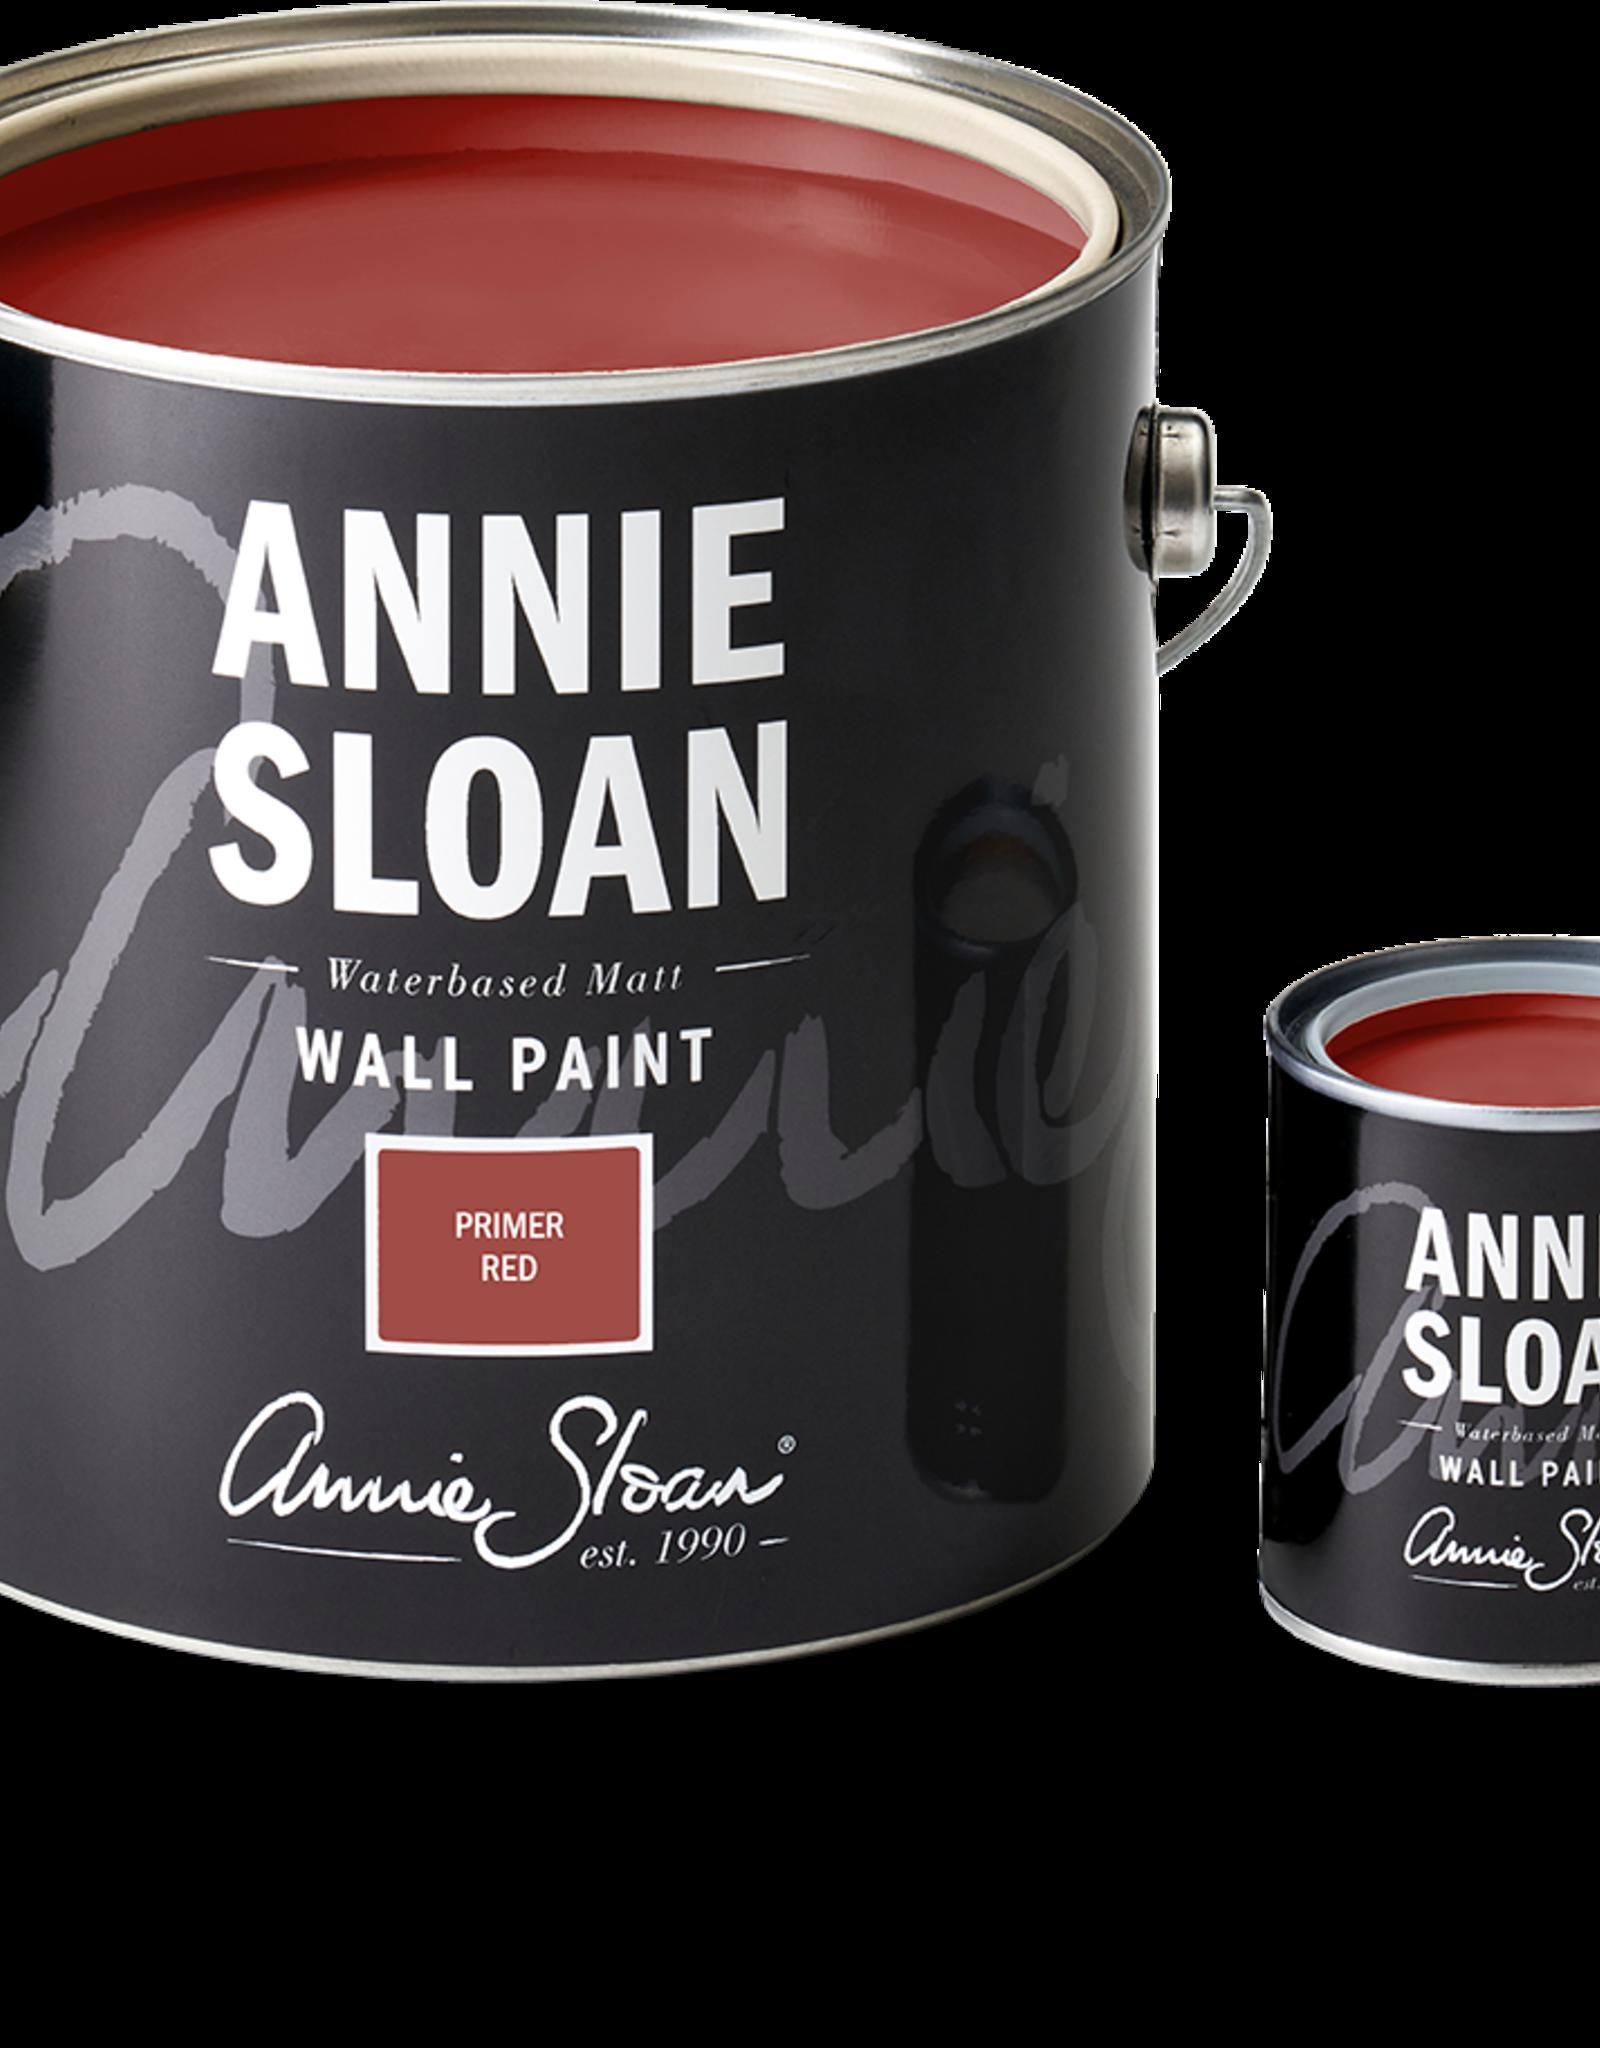 Annie Sloan Krijtverf Annie Sloan, New Wall Paint Primer Red 2500ml